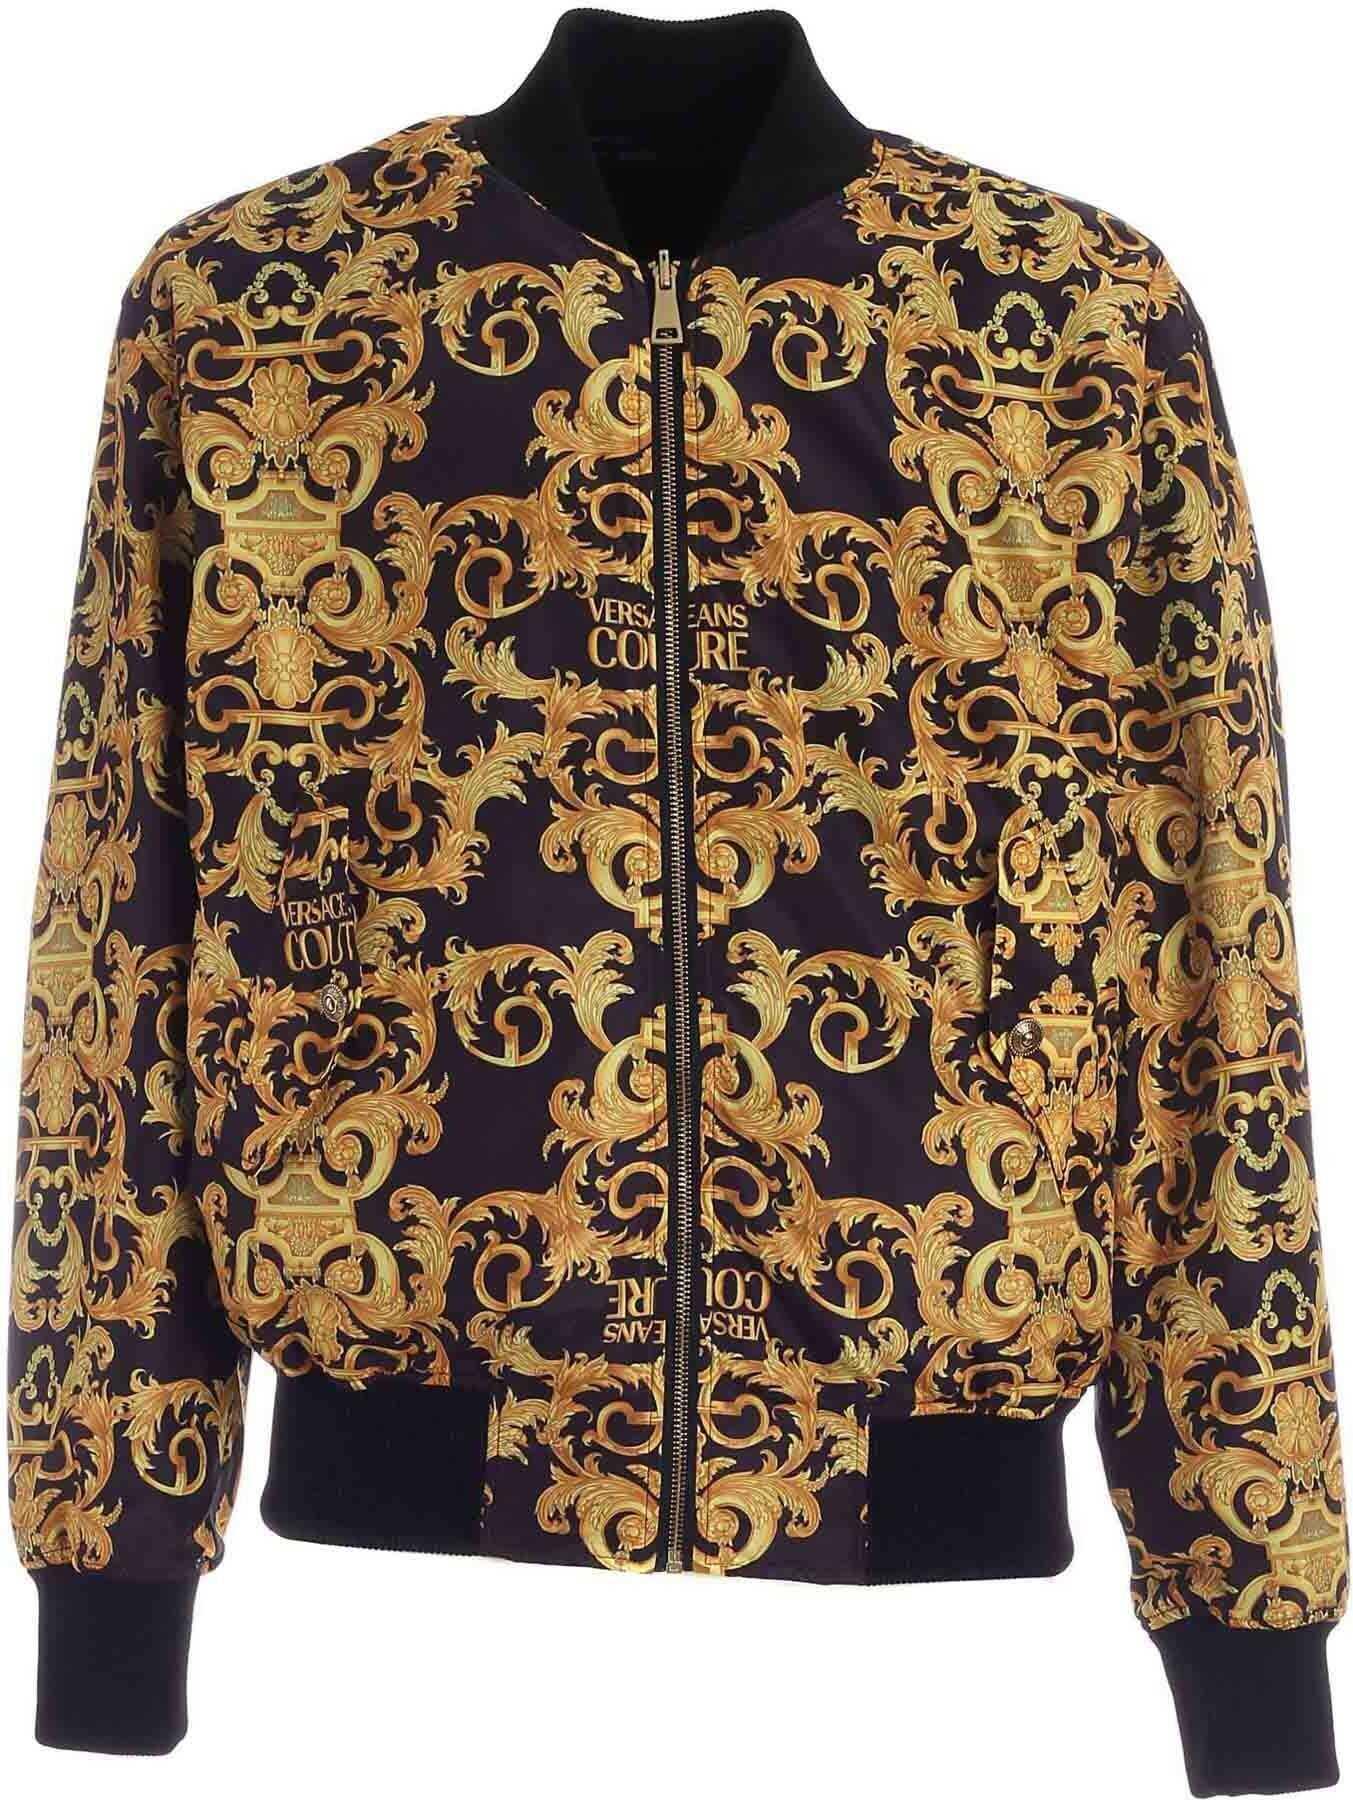 Versace Jeans Couture Logo Baroque Print Bomber Jacket In Black Black imagine